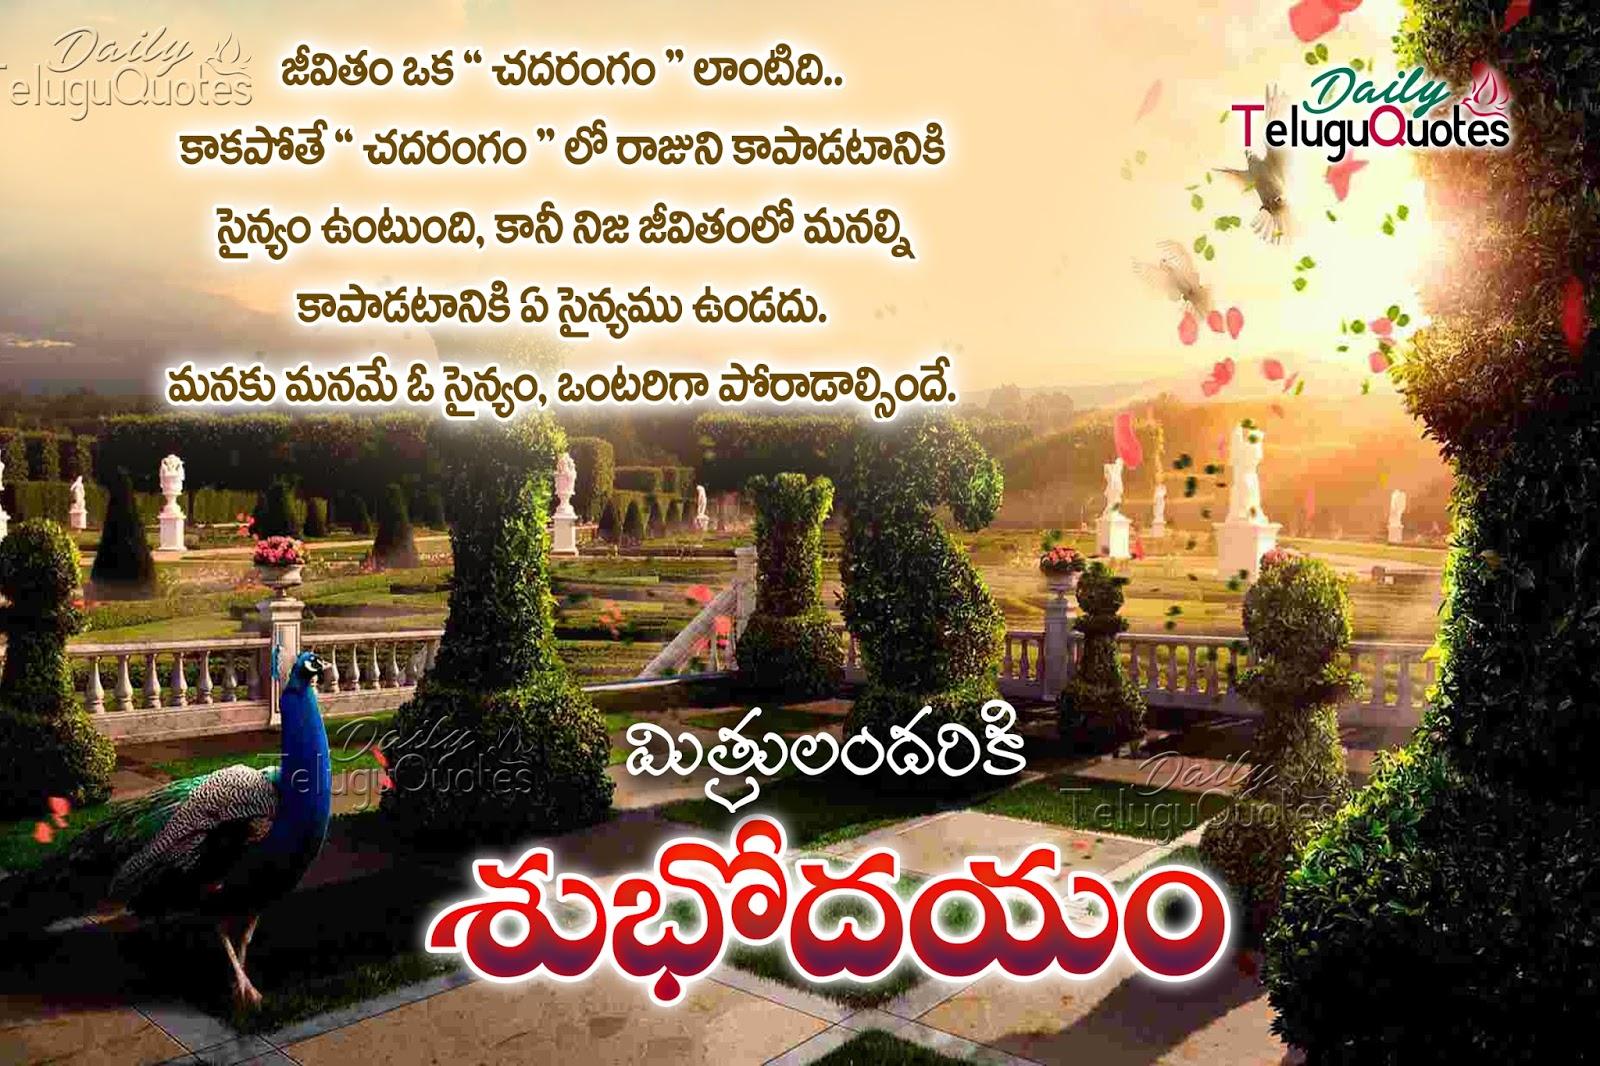 Inspiring Telugu Good Morning Greeting Quotes Hd Wallpapers